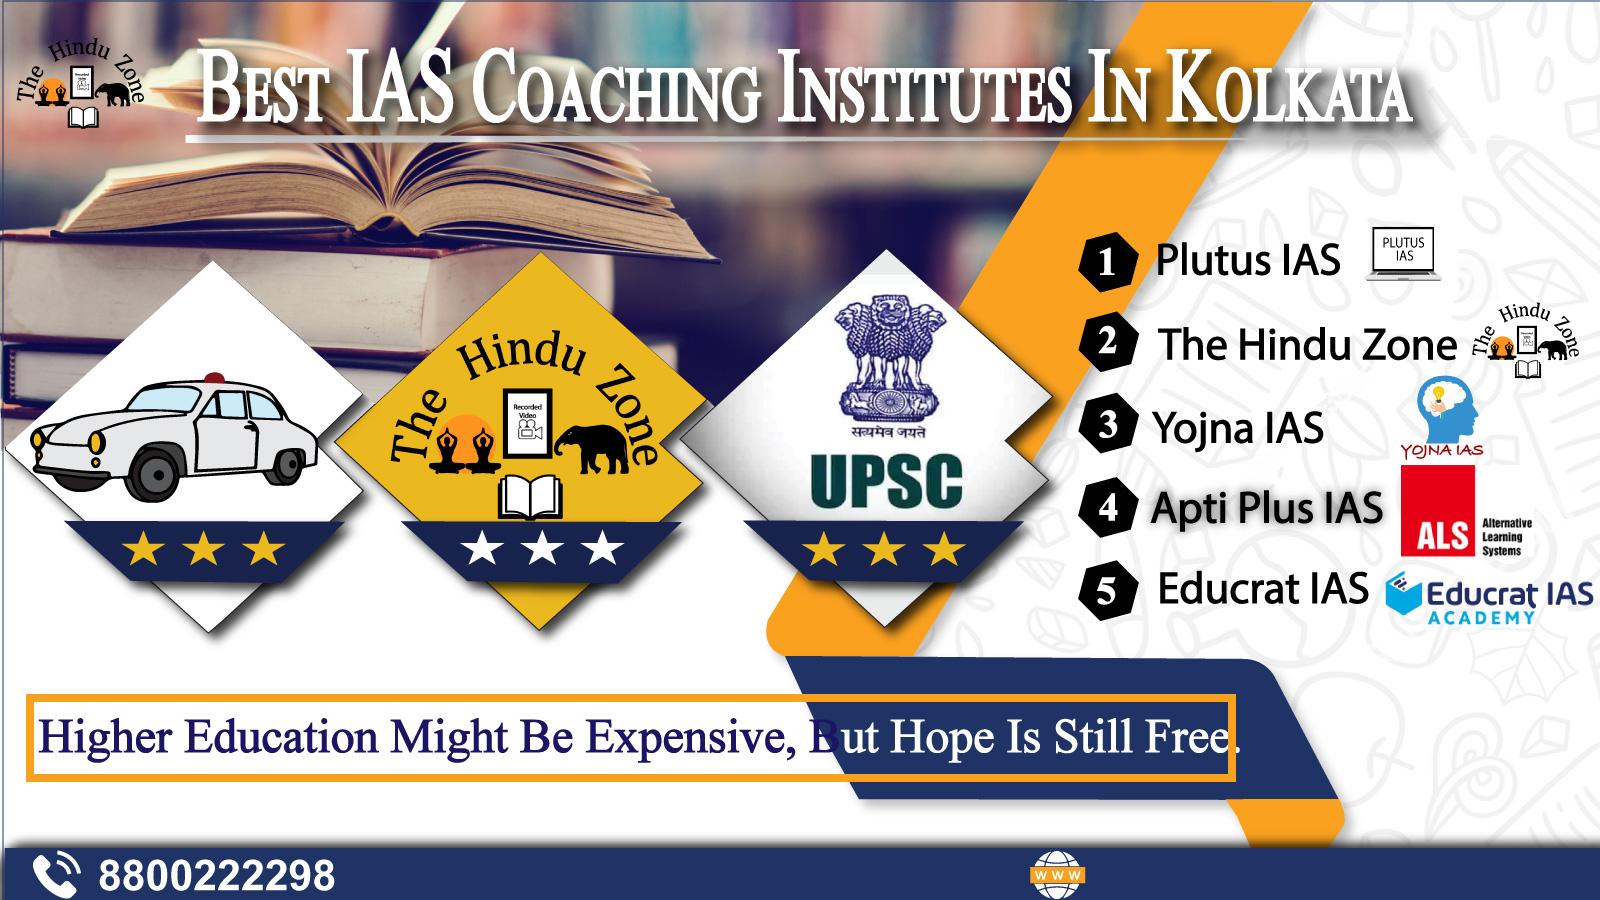 Top 10 IAS Coaching Institutes In Kolkata